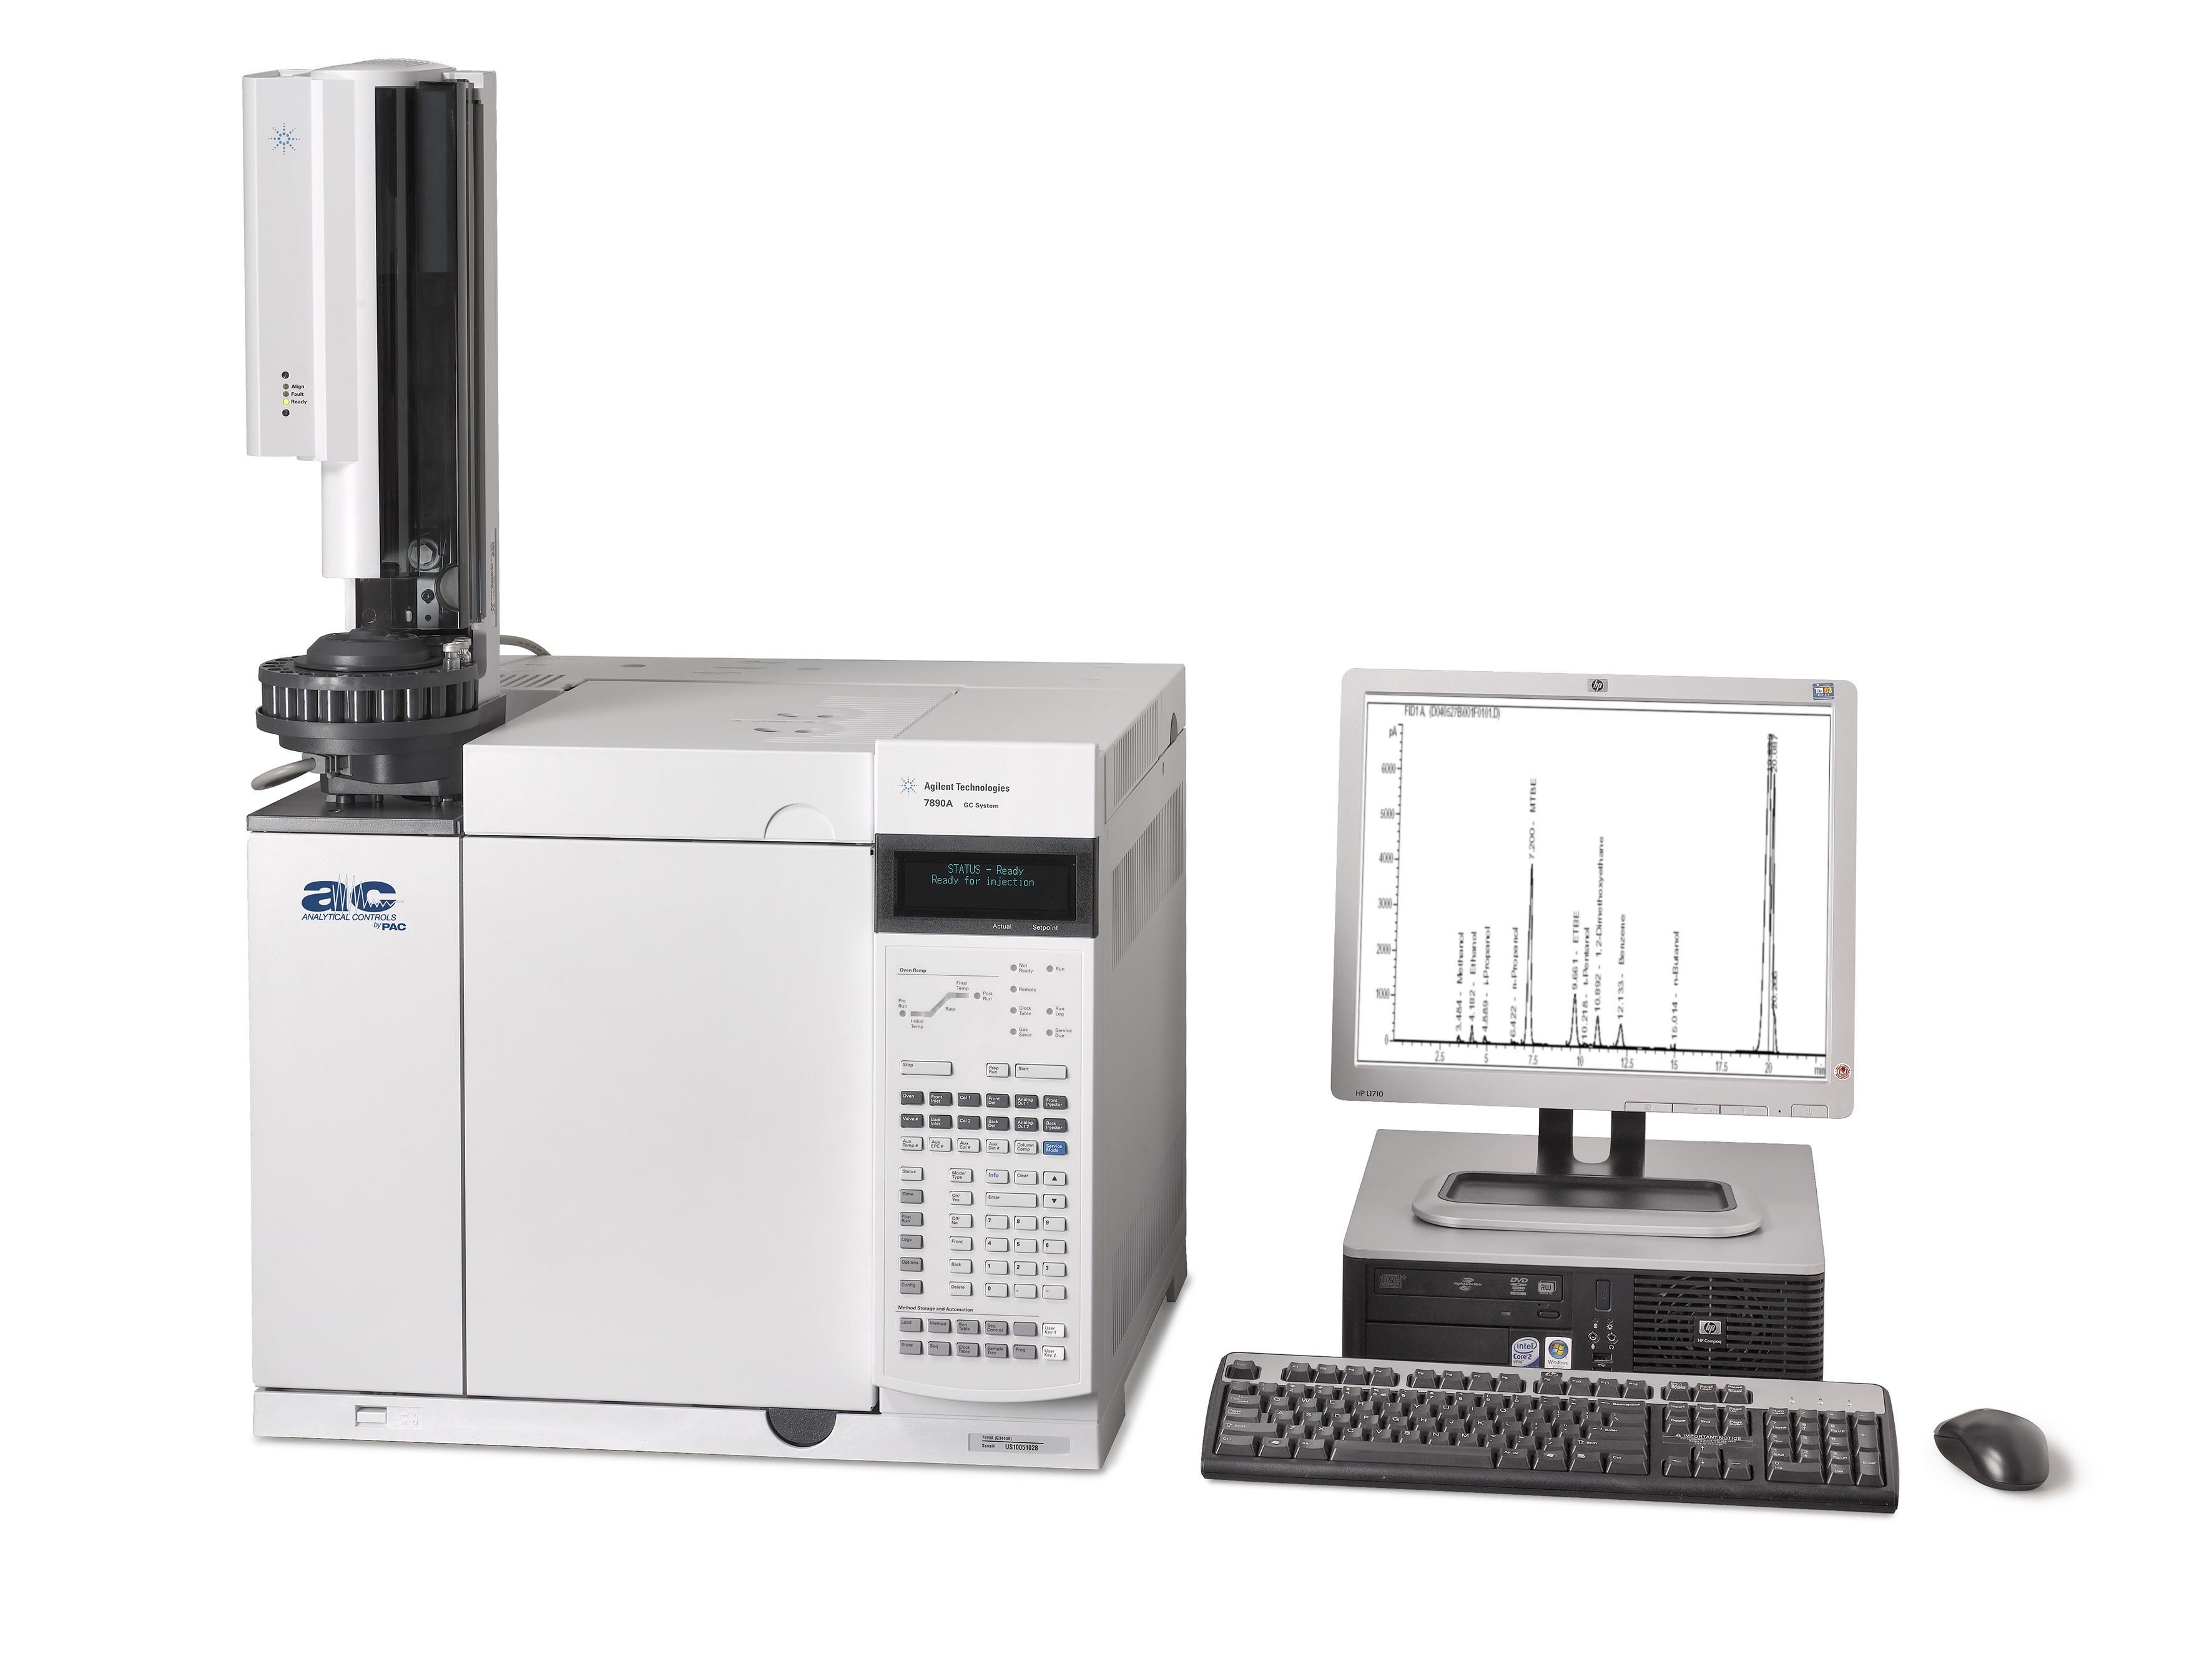 D5580/D4815 - Aromatics and Oxygenates